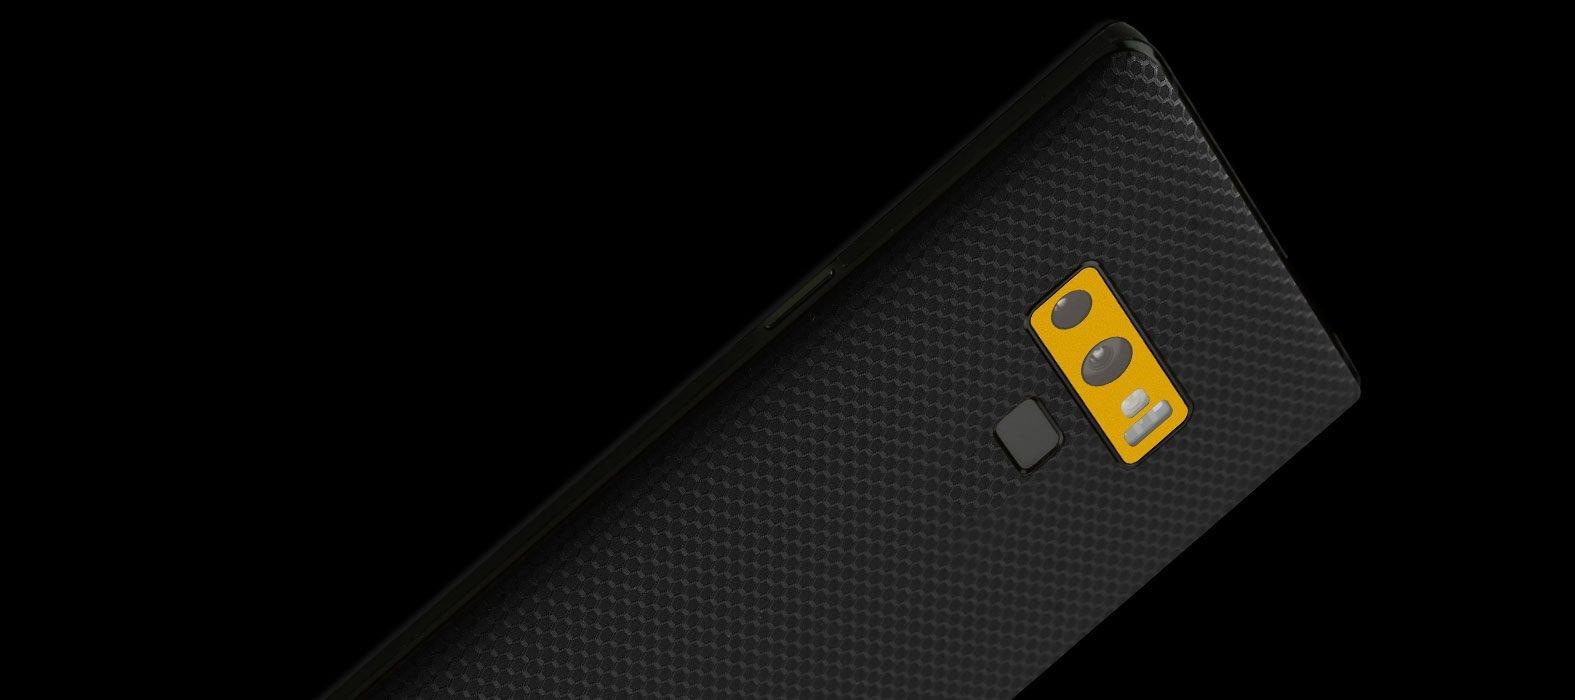 Galaxy Note 9 Black Matrix Skins